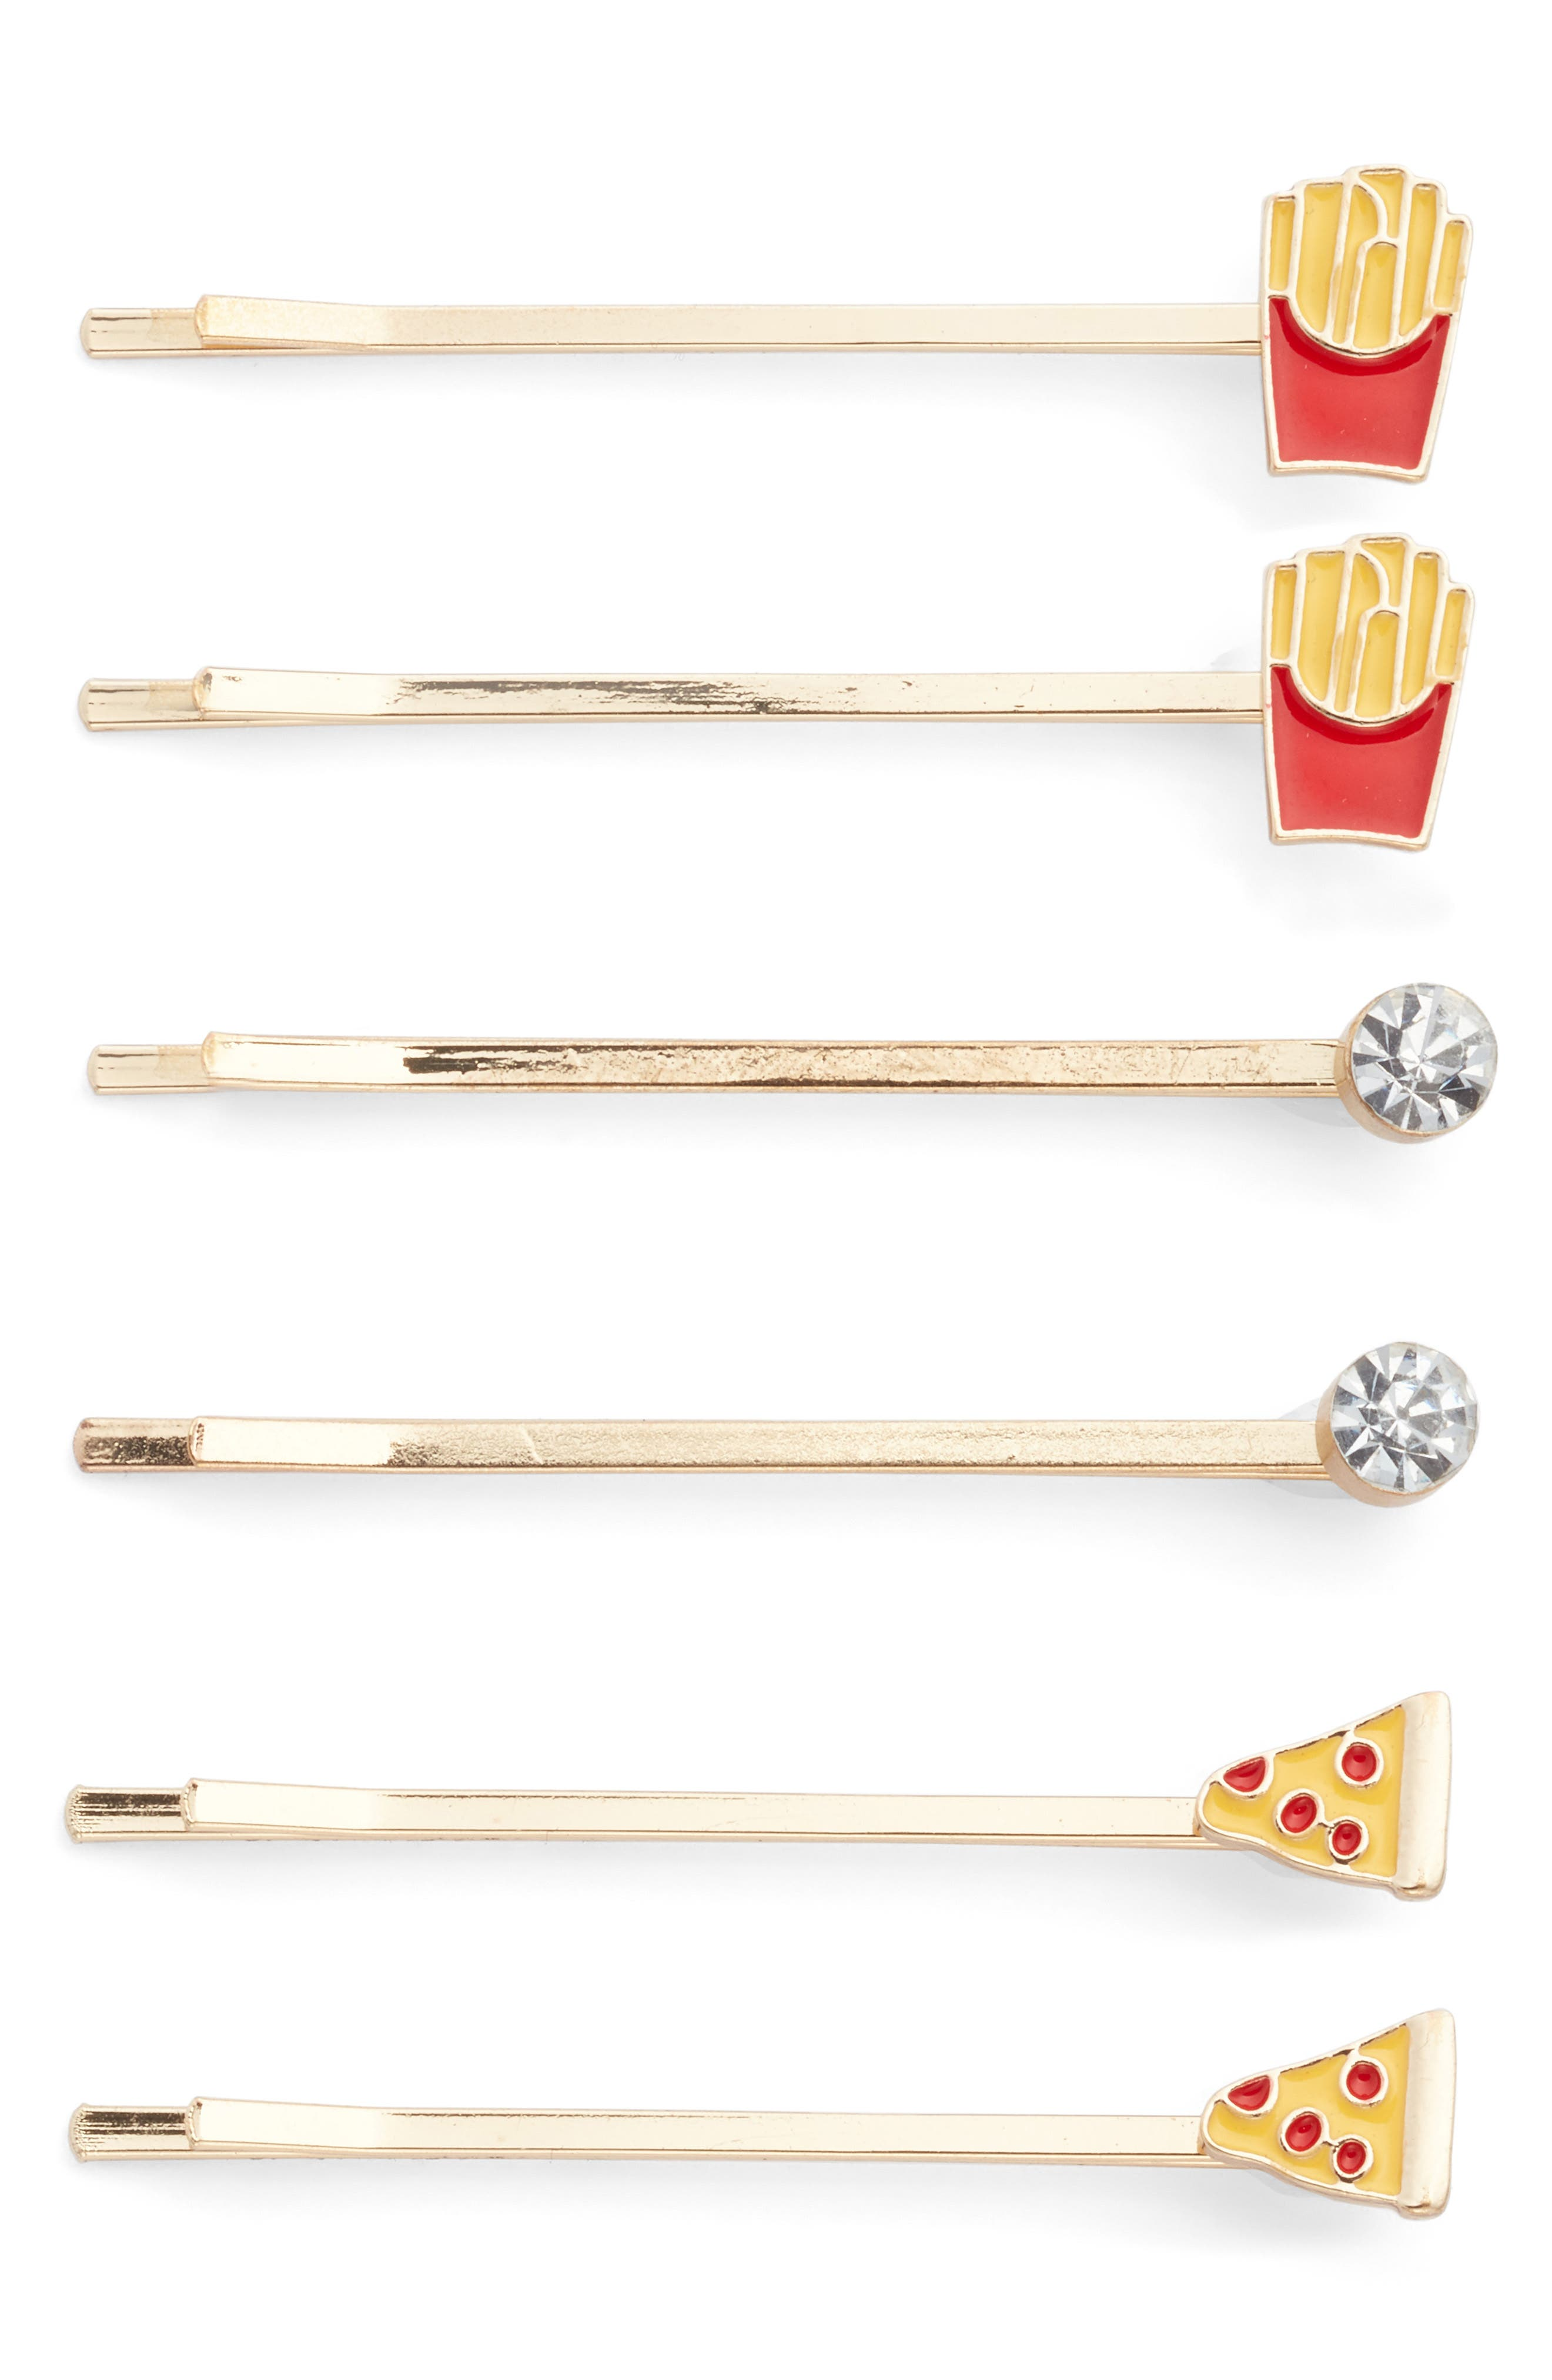 Alternate Image 1 Selected - Capelli New York Junk Food Set of 6 Bobby Pins (Big Girls)